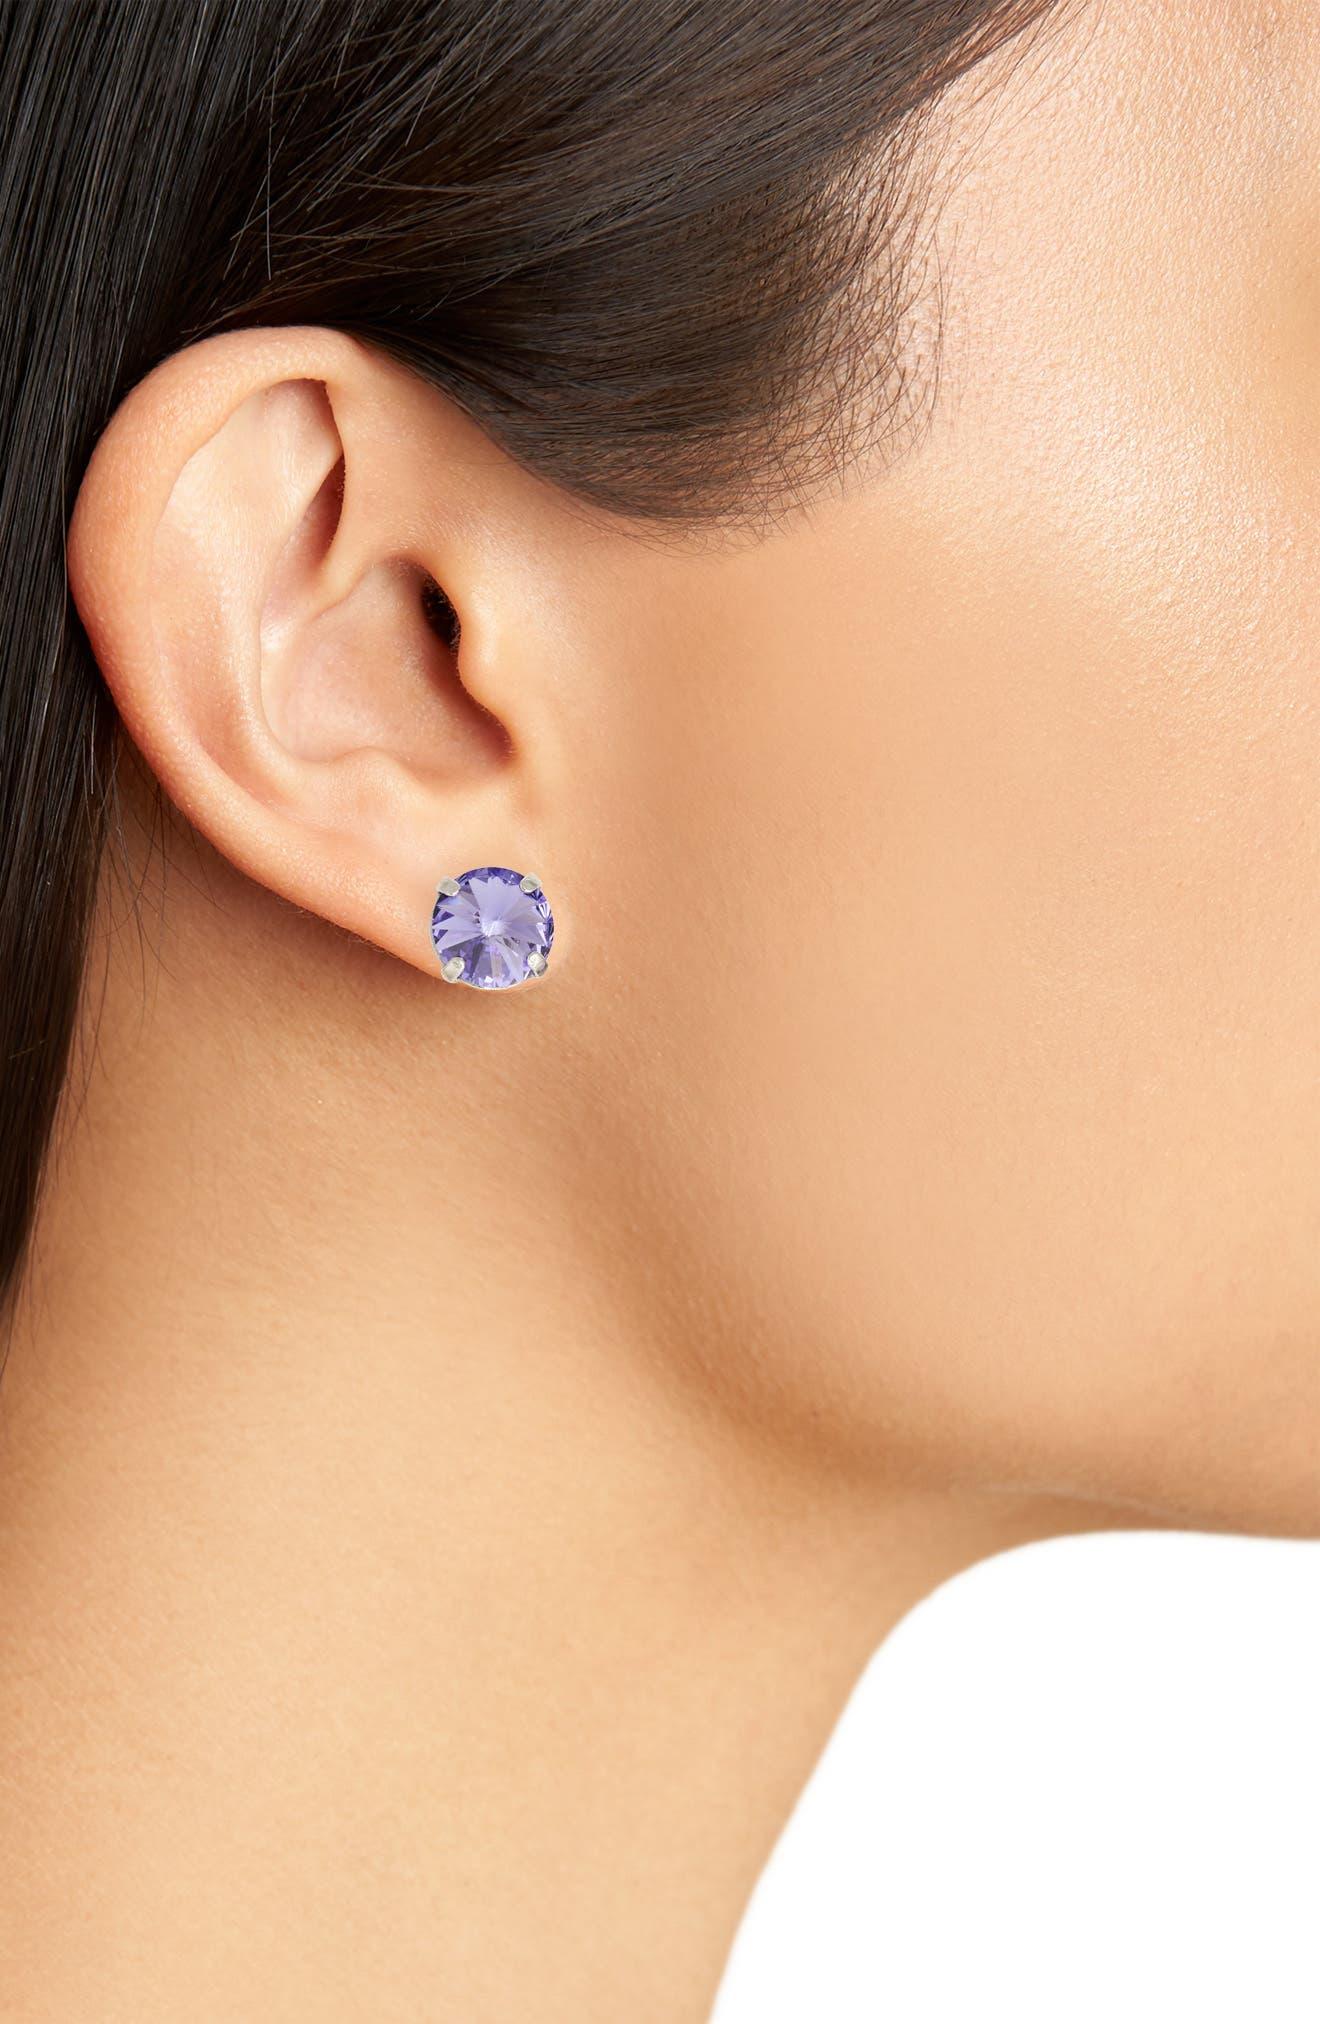 Radiant Rivoli Earrings,                             Alternate thumbnail 2, color,                             Purple